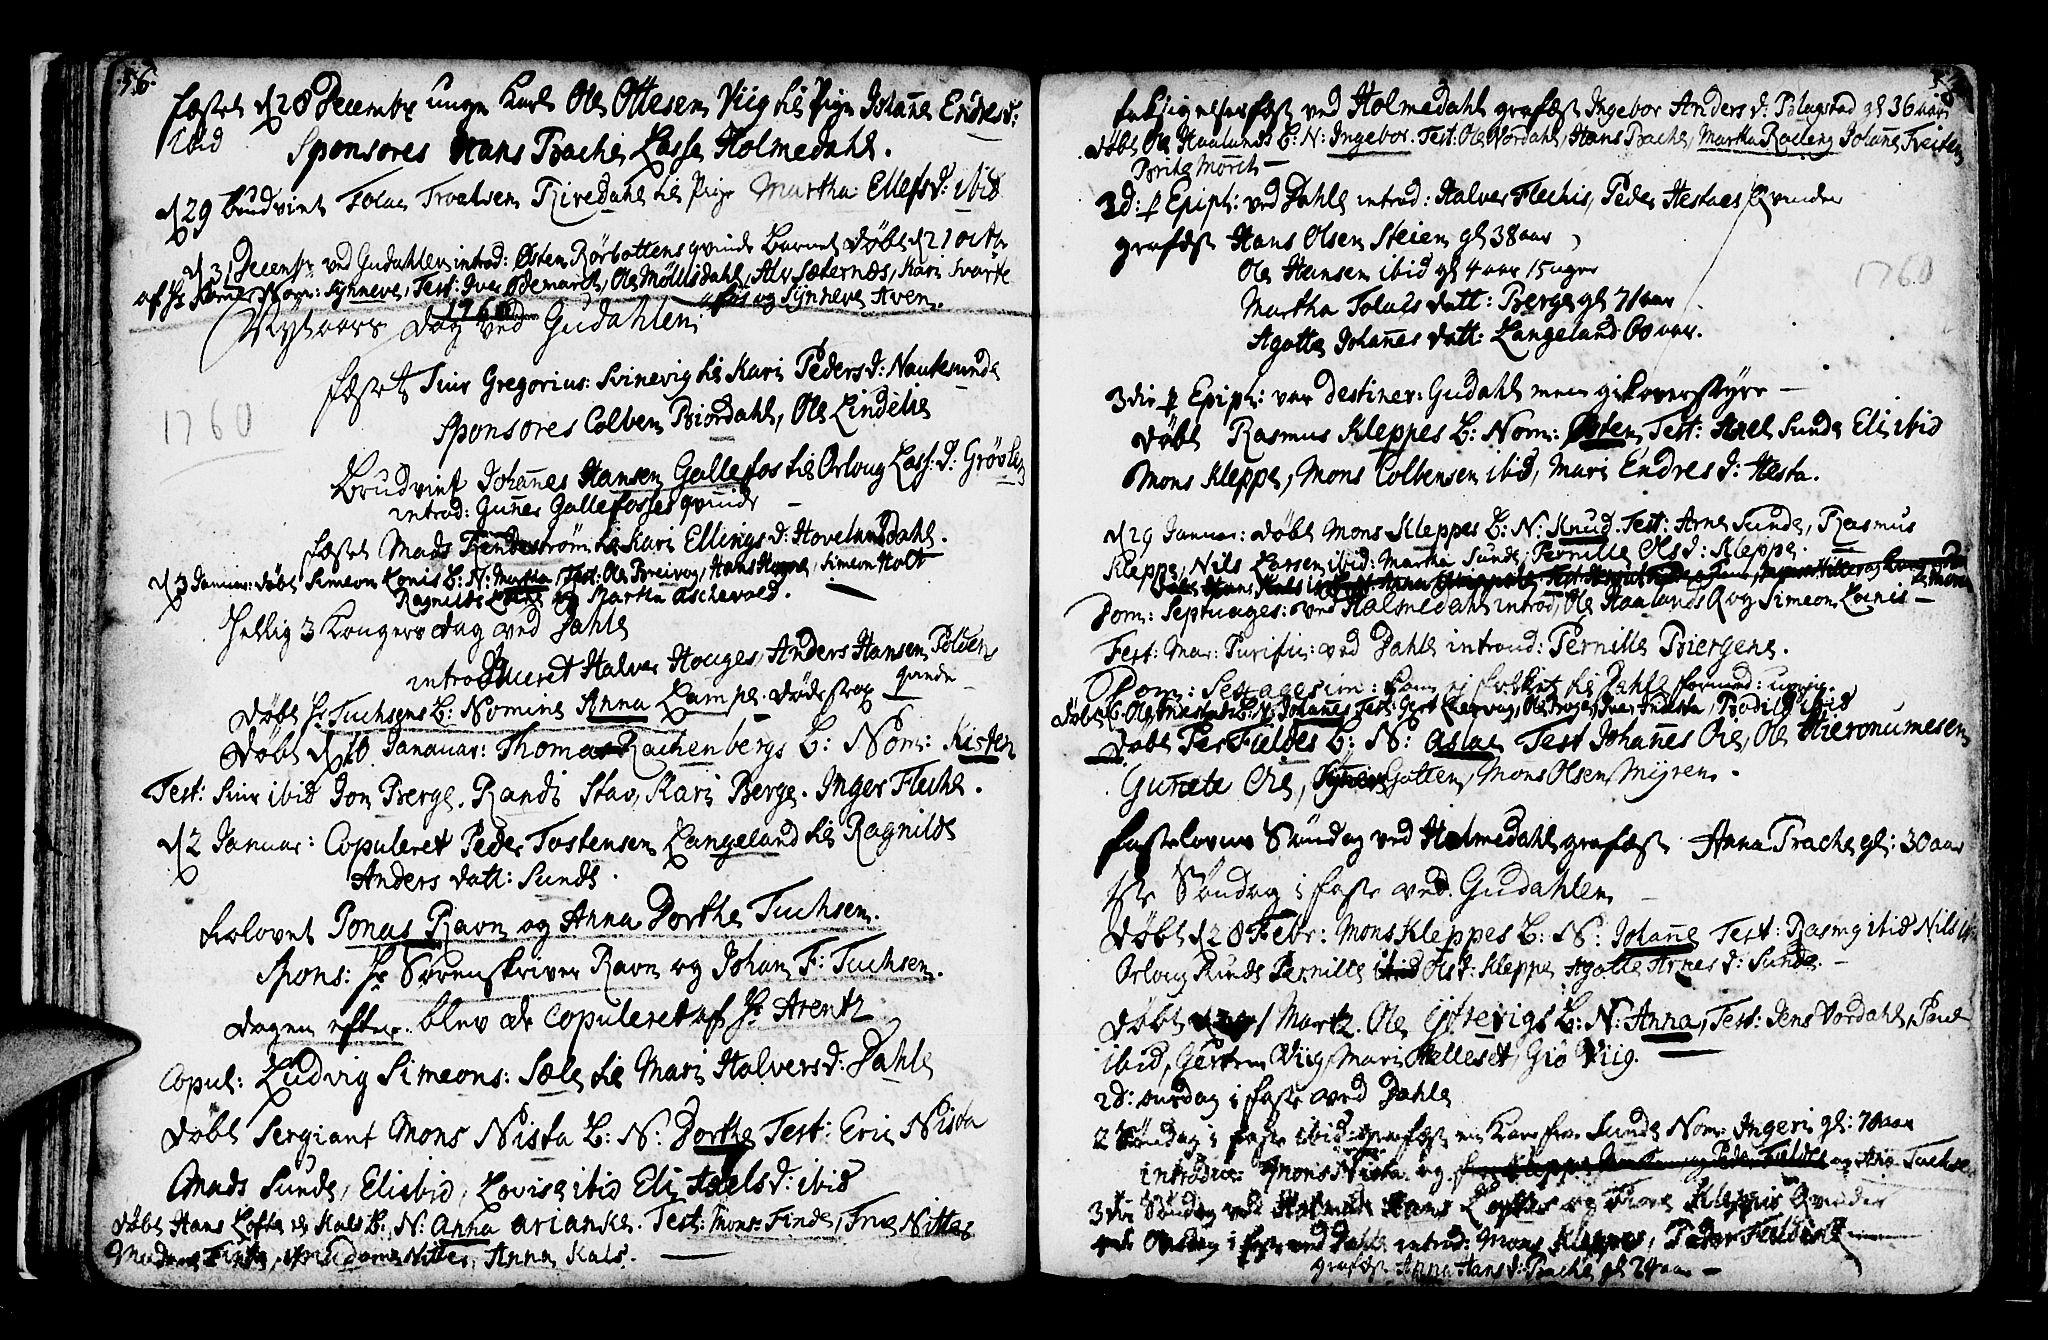 SAB, Fjaler Sokneprestembete, H/Haa: Ministerialbok nr. A 1, 1755-1778, s. 58-59